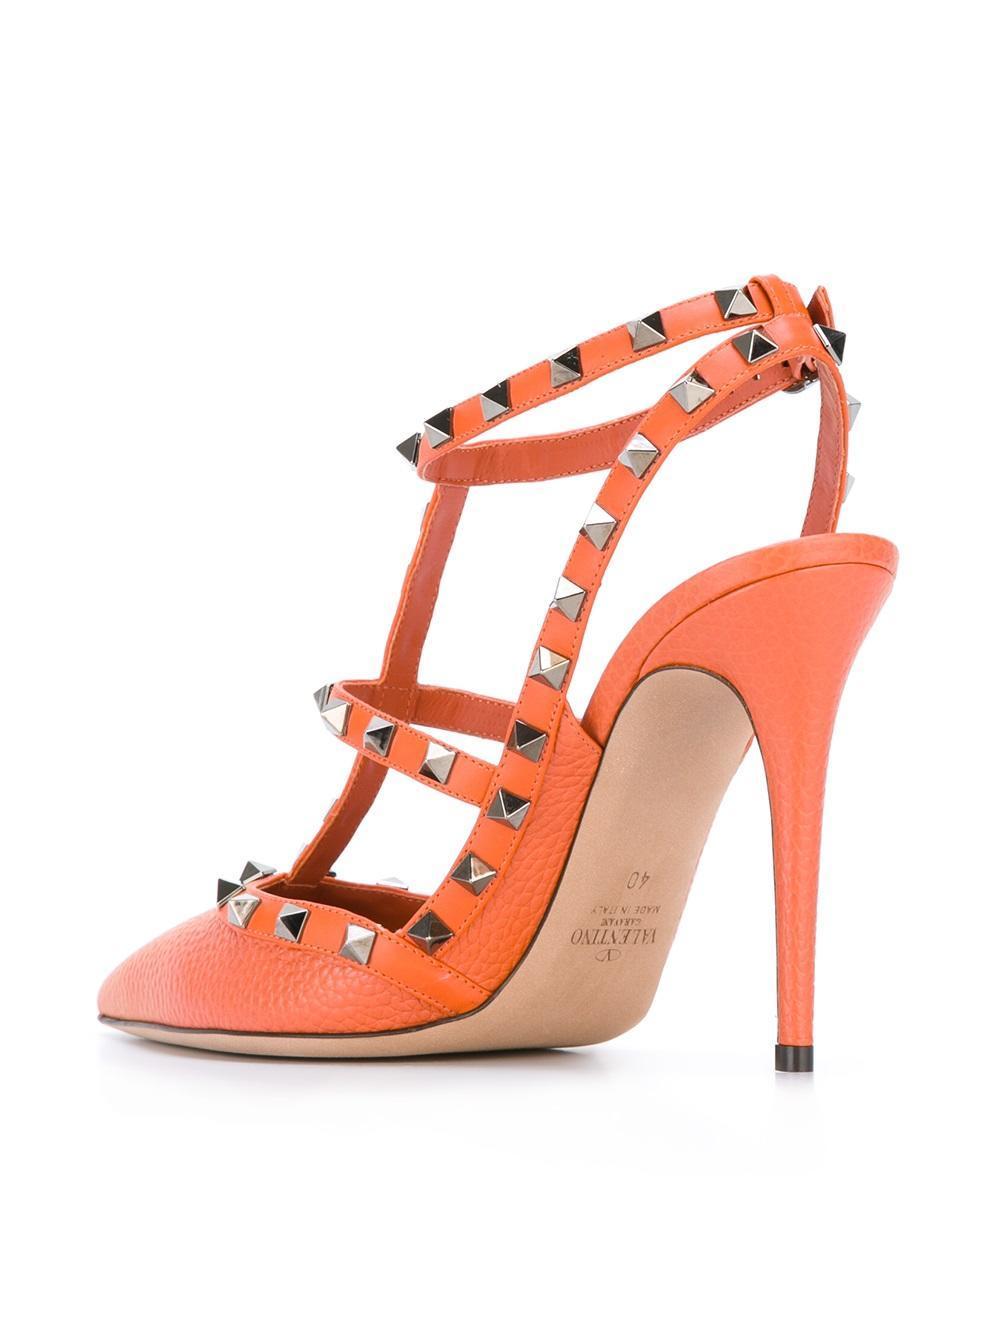 lyst valentino garavani rockstud pumps in orange. Black Bedroom Furniture Sets. Home Design Ideas